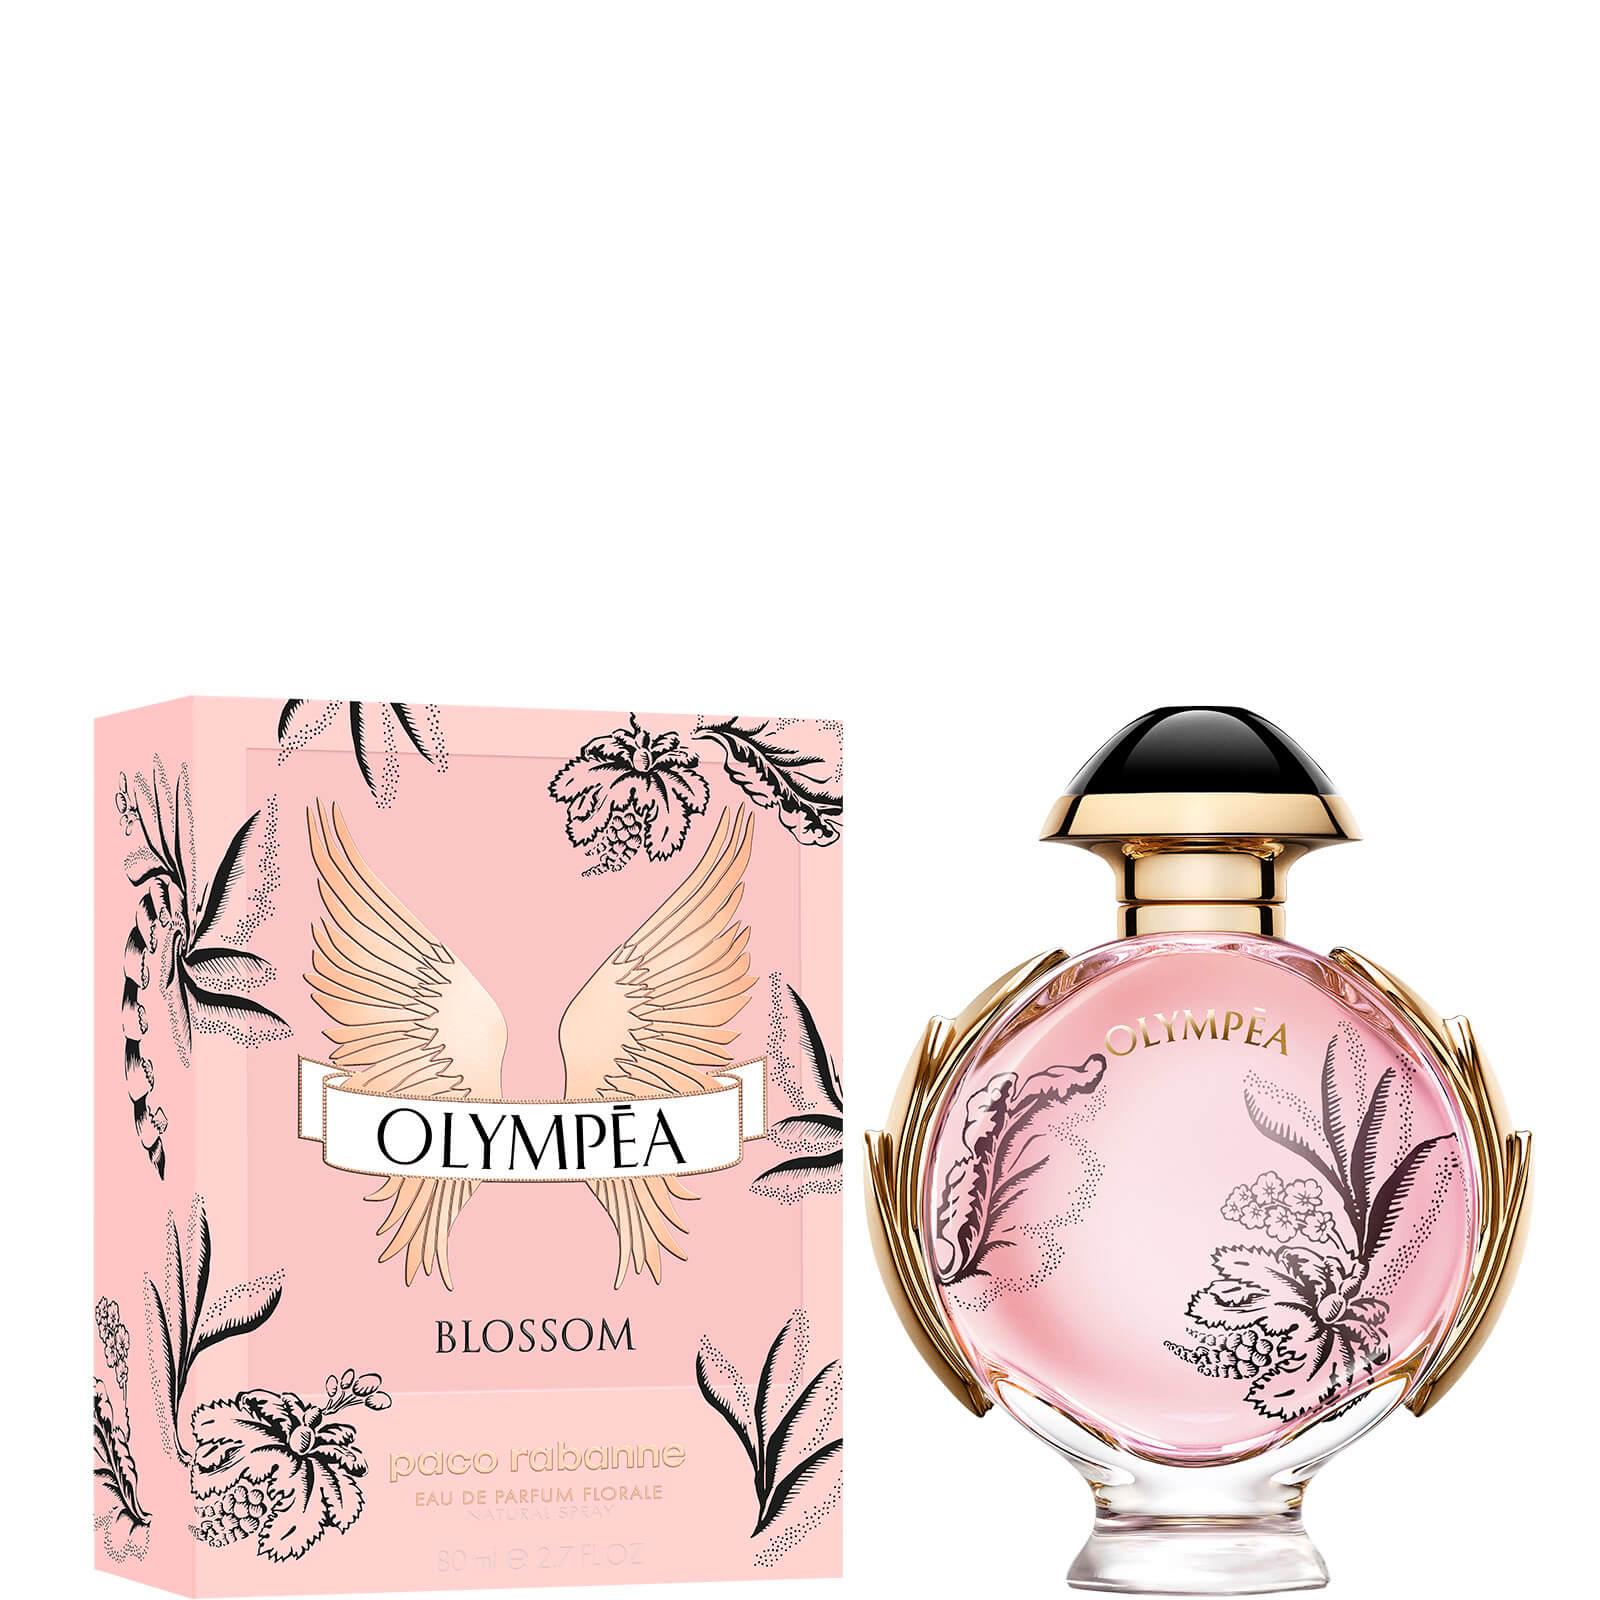 paco rabanne eau de parfum olympea> OFF-63%